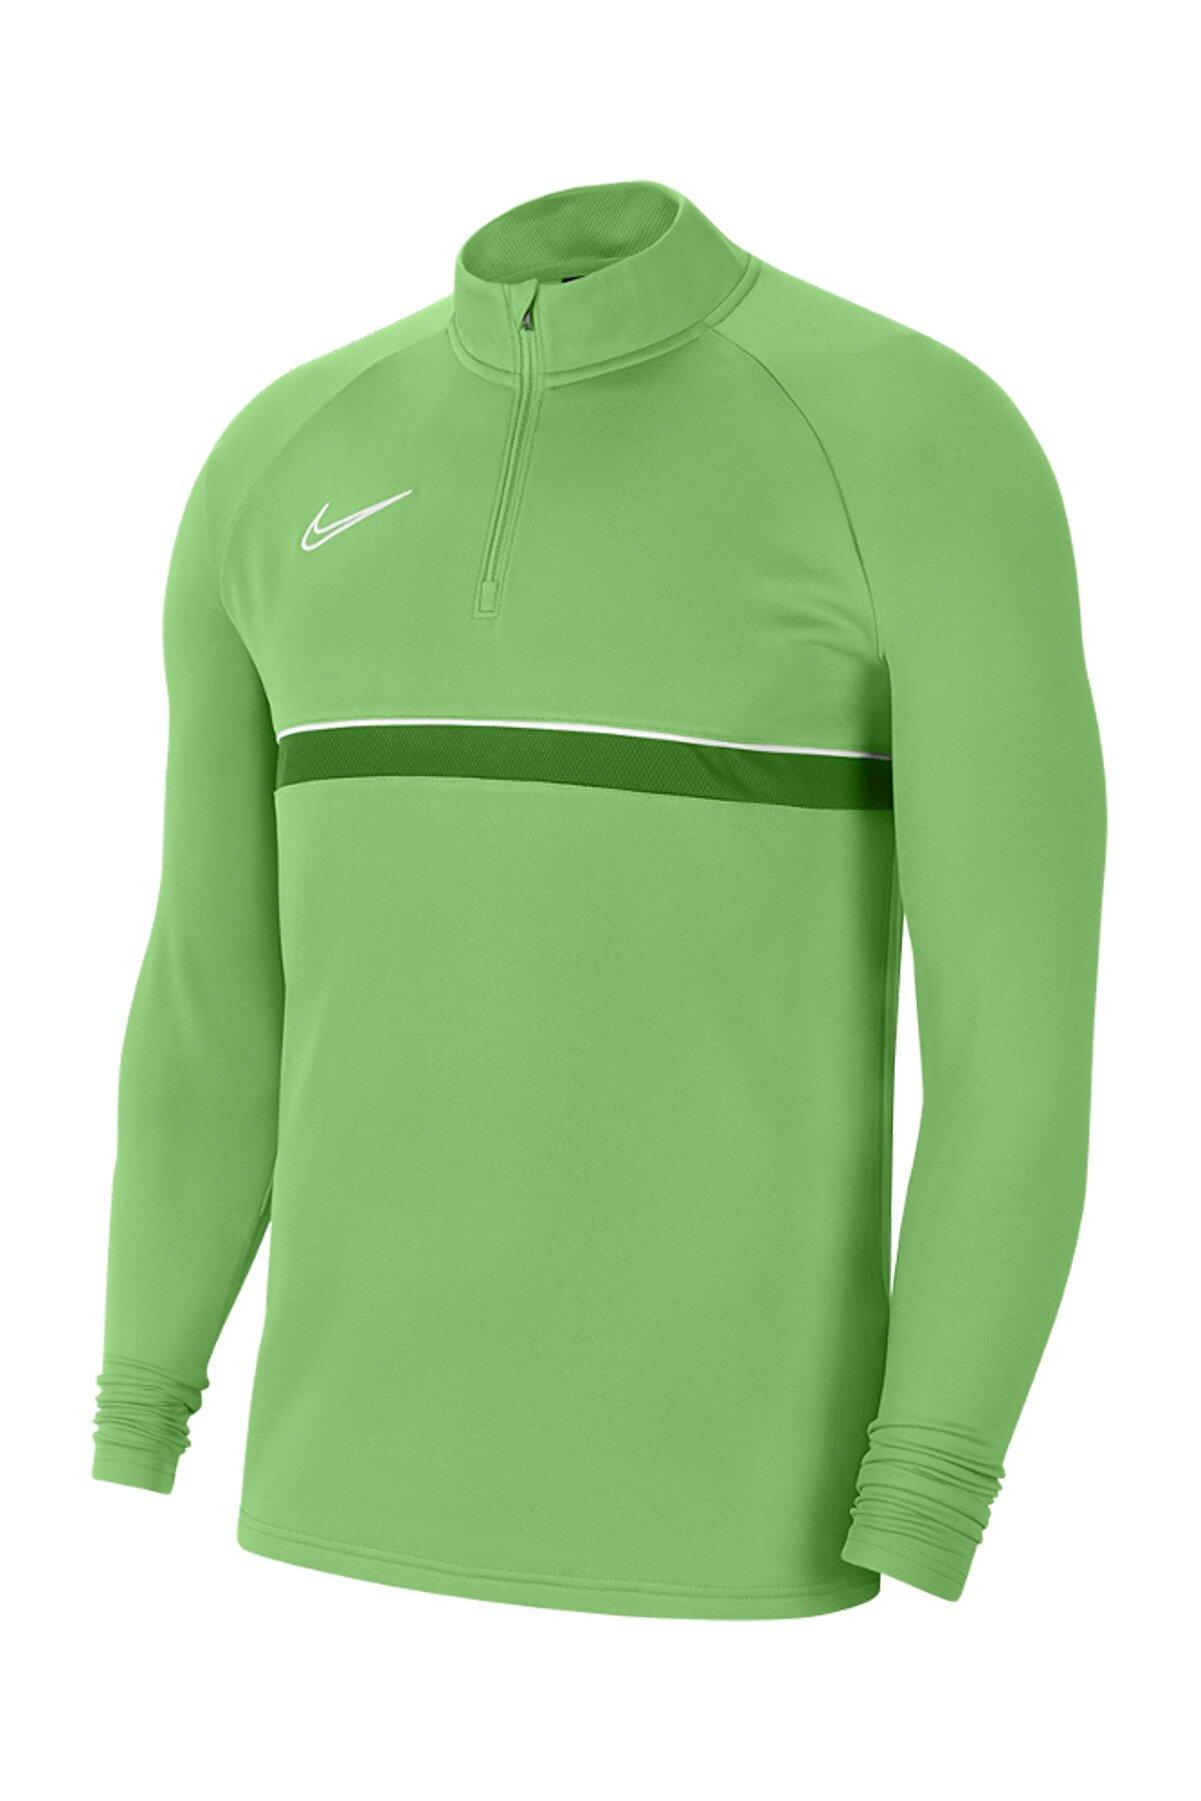 Nike Erkek Spor Sweatshirt - Dri-Fit Academy - CW6110-362